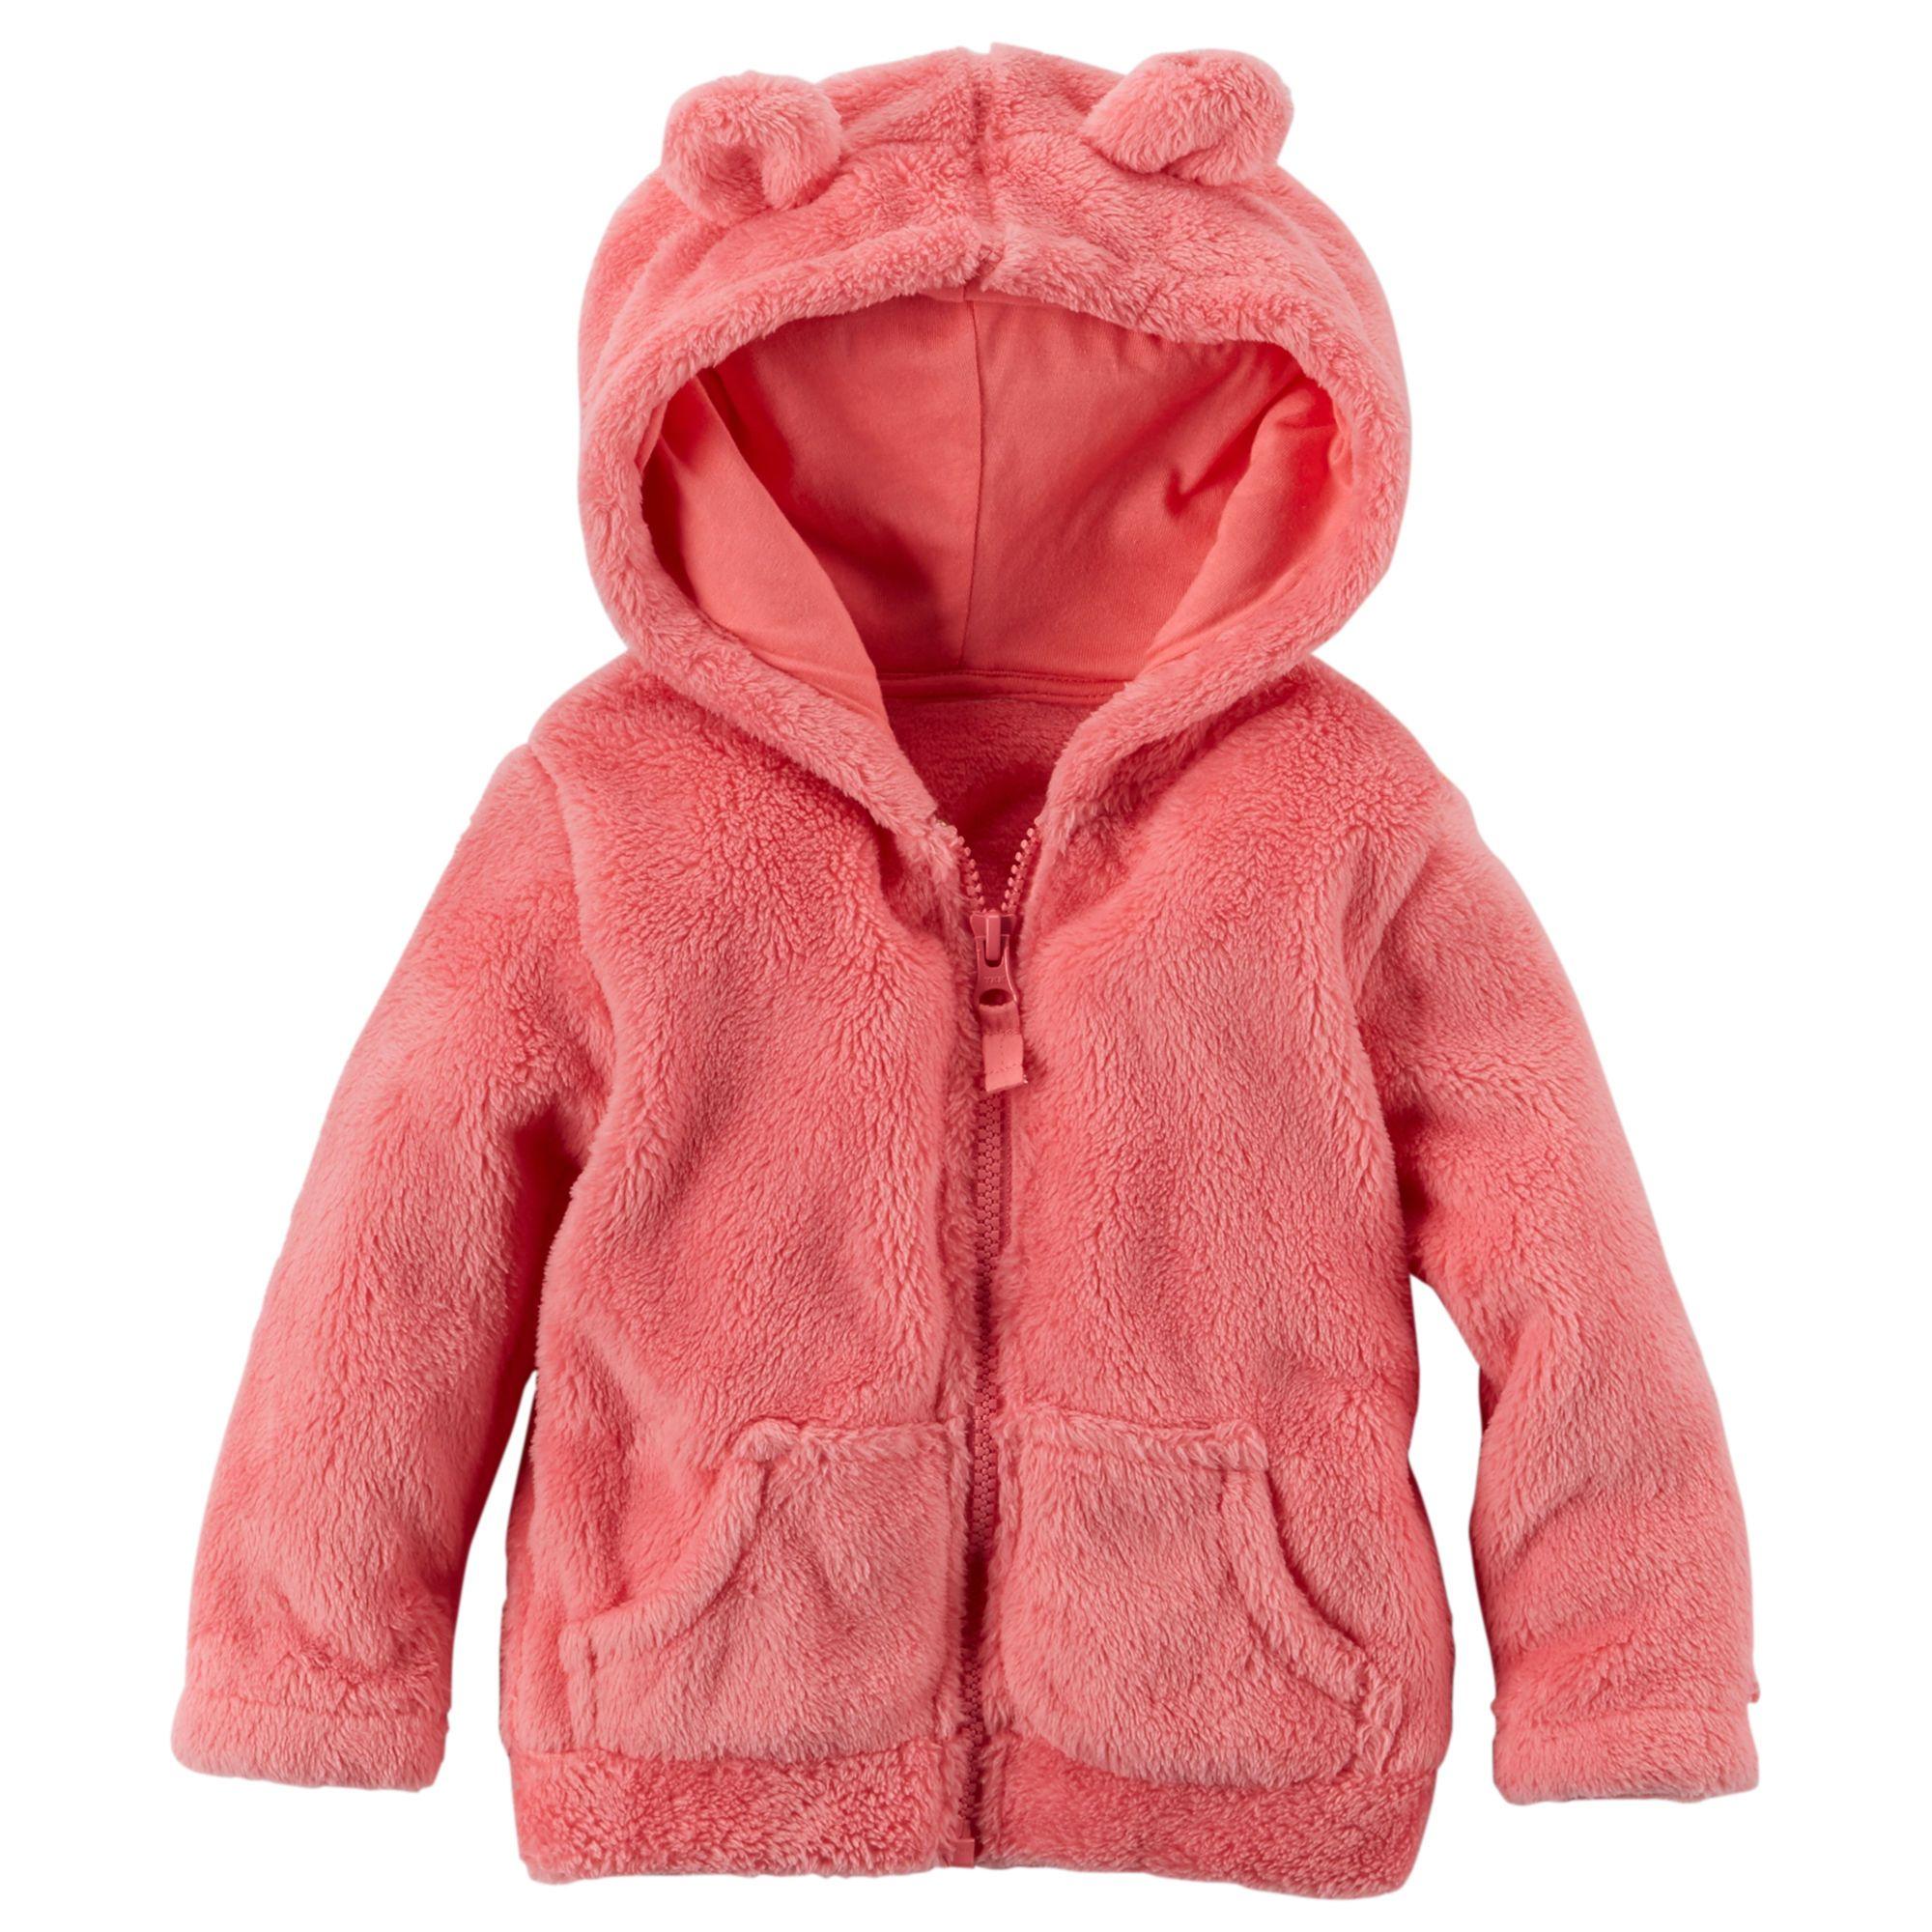 Baby Girl Snow Fleece Hoodie | Carters.com | Fashion for the ...